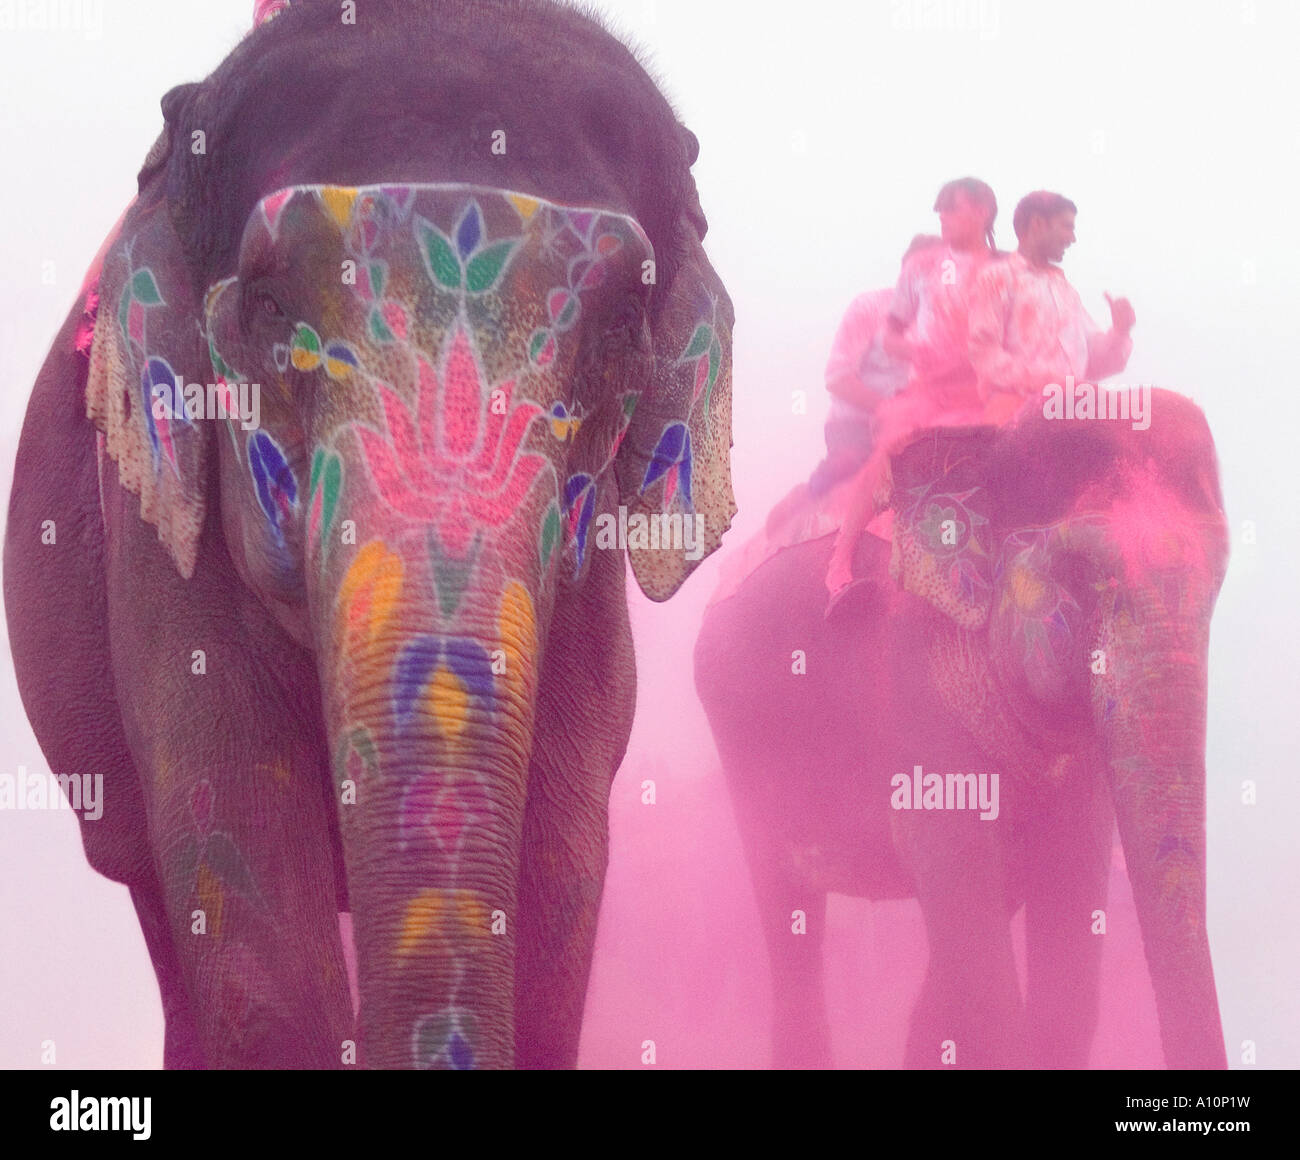 Tres elefantes en un festival de elefantes, Jaipur, Rajasthan, India Imagen De Stock